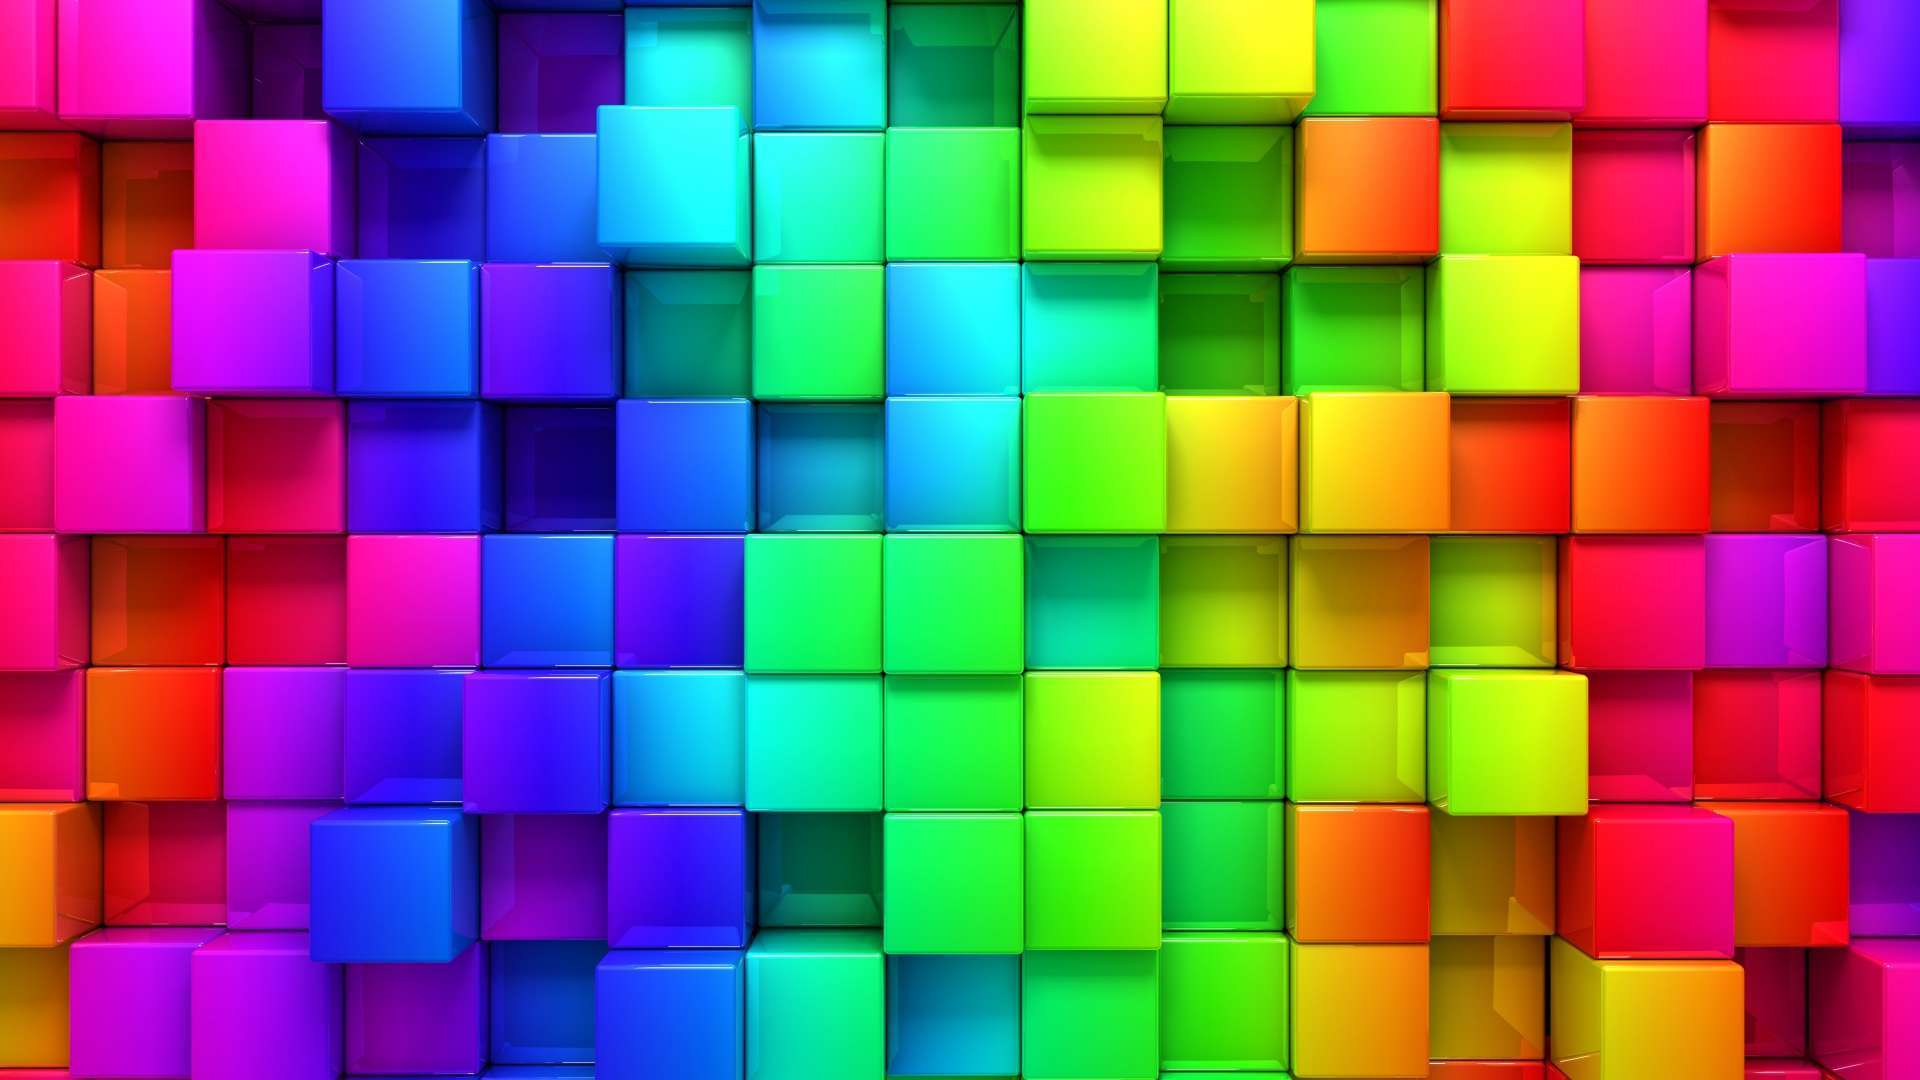 Free Download Wallpaper Blocks Rainbow 3d Graphics Background Hd